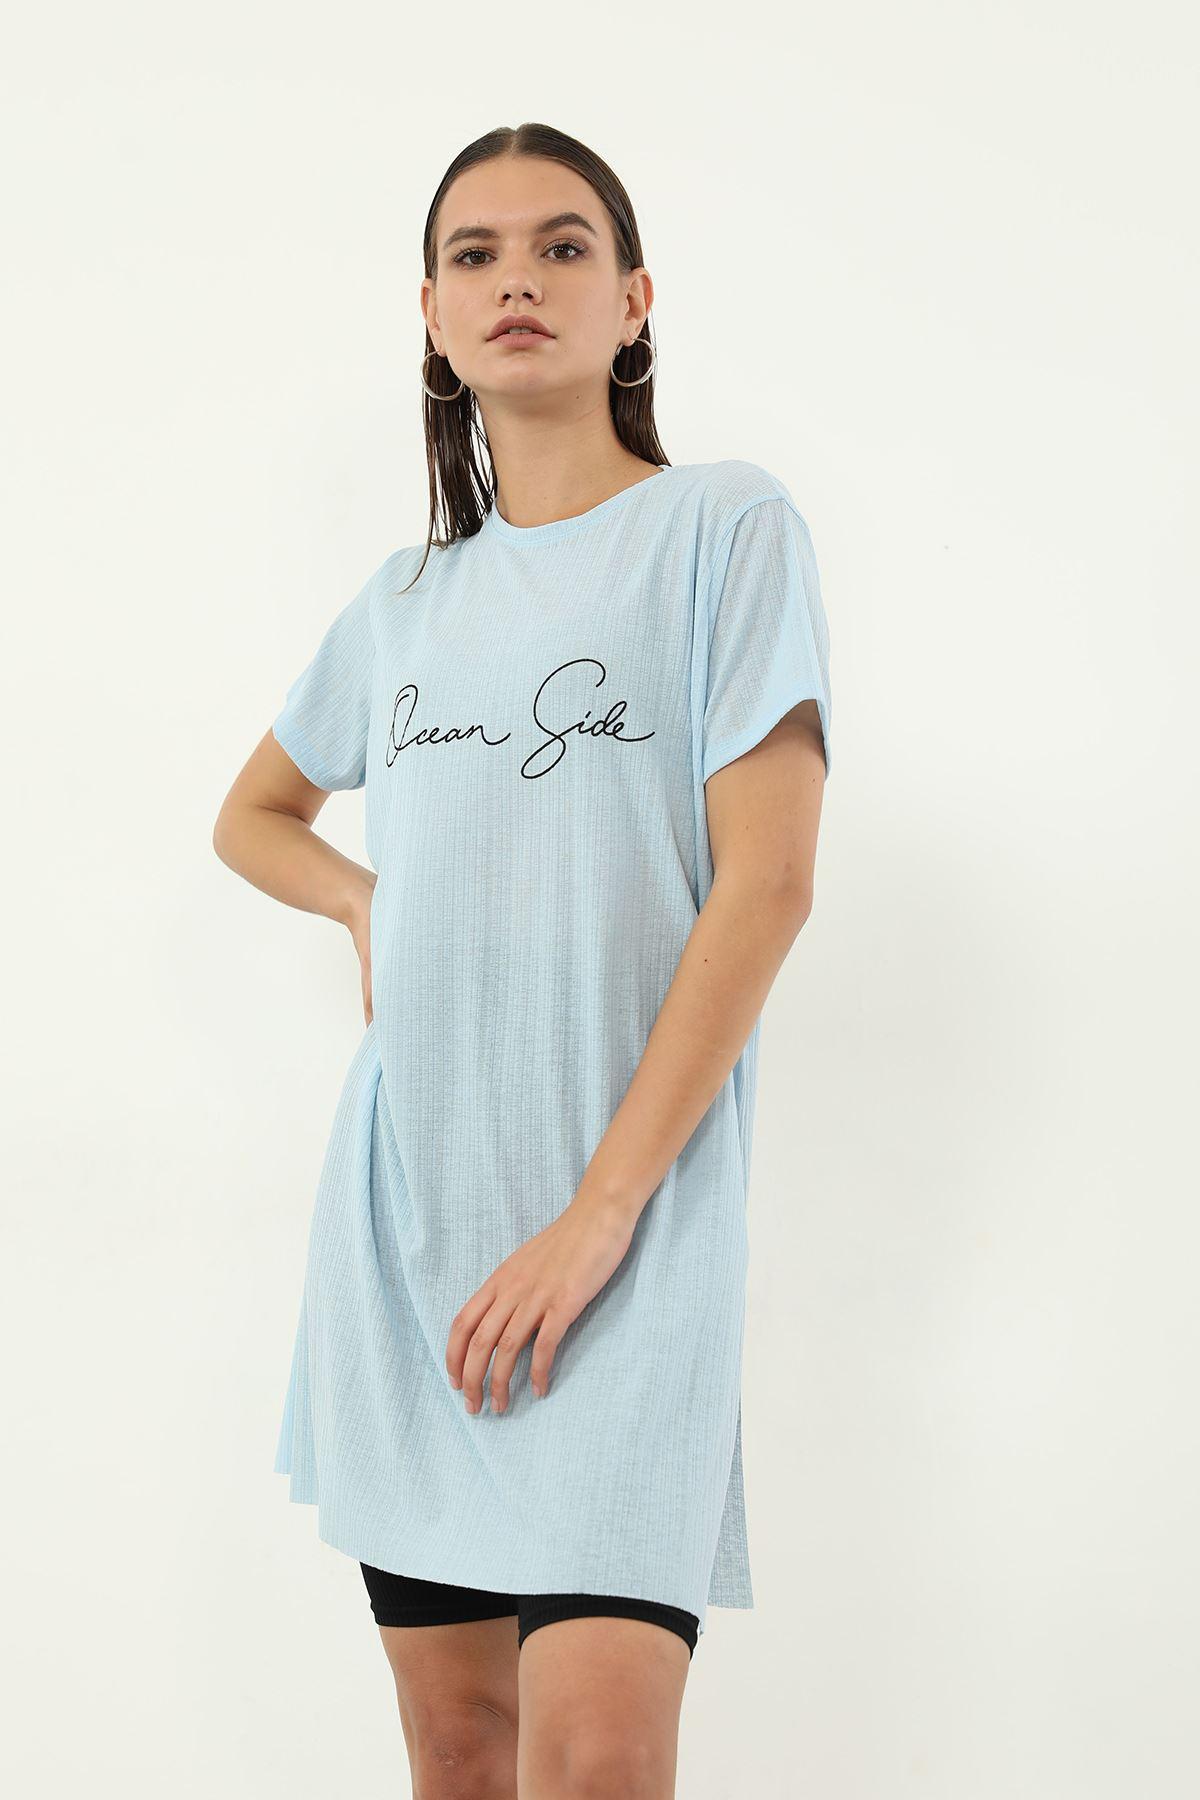 Dream Side Baskılı T-shirt-Bebemavi